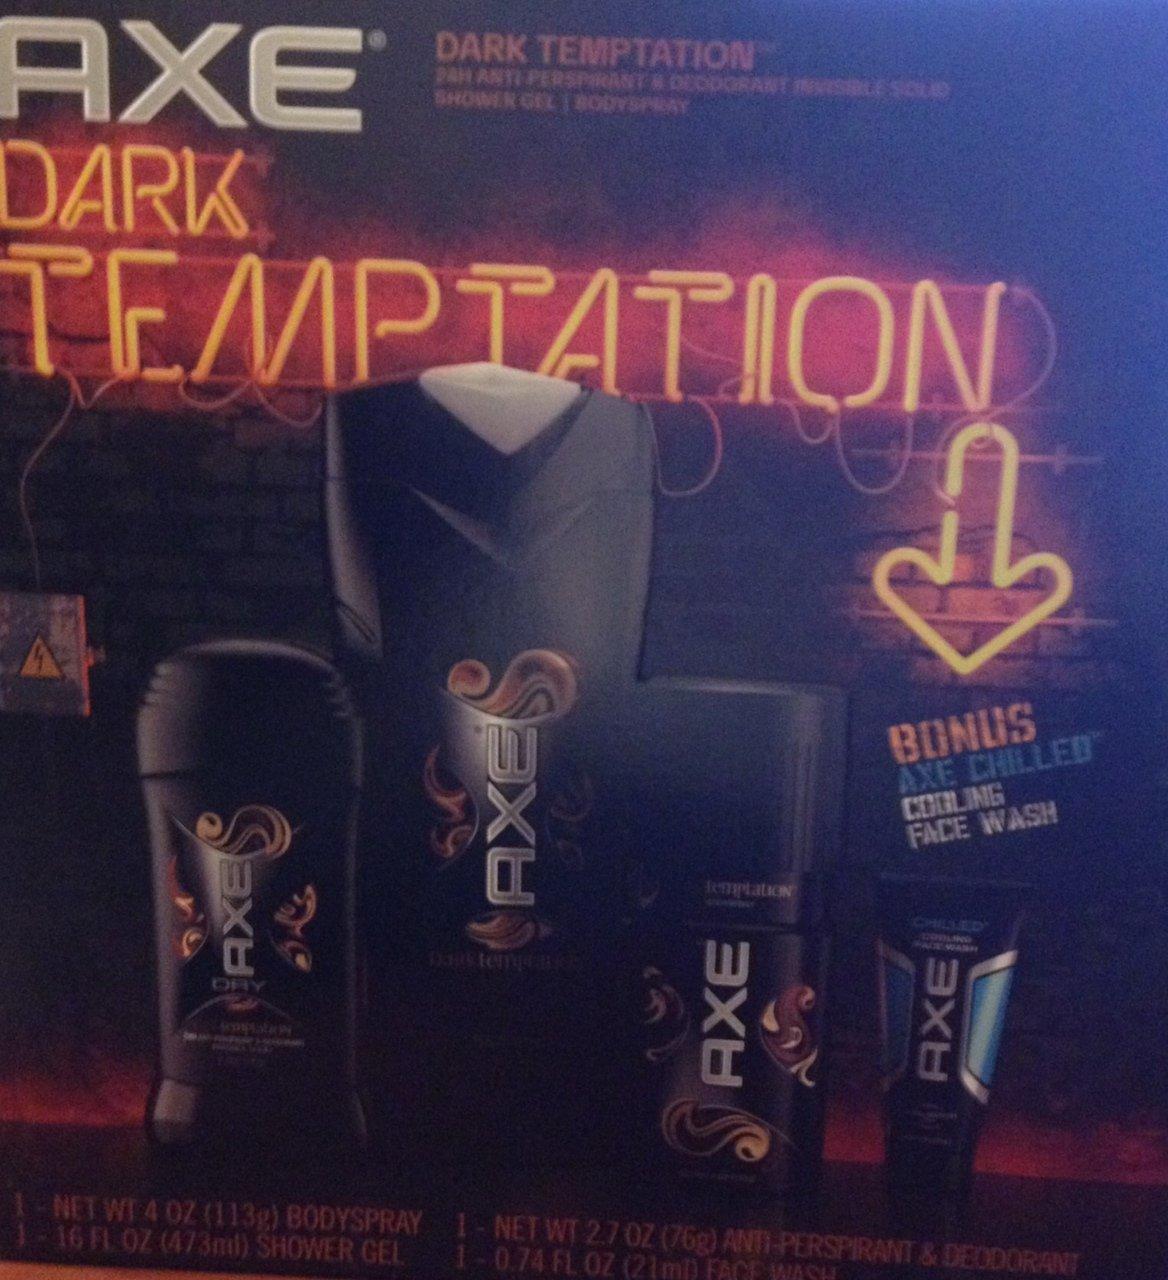 Cheap Axe Dark Temptation Gift Set Find Deodorant Bodyspray Gold 150ml Twin Pack Get Quotations Body Wash